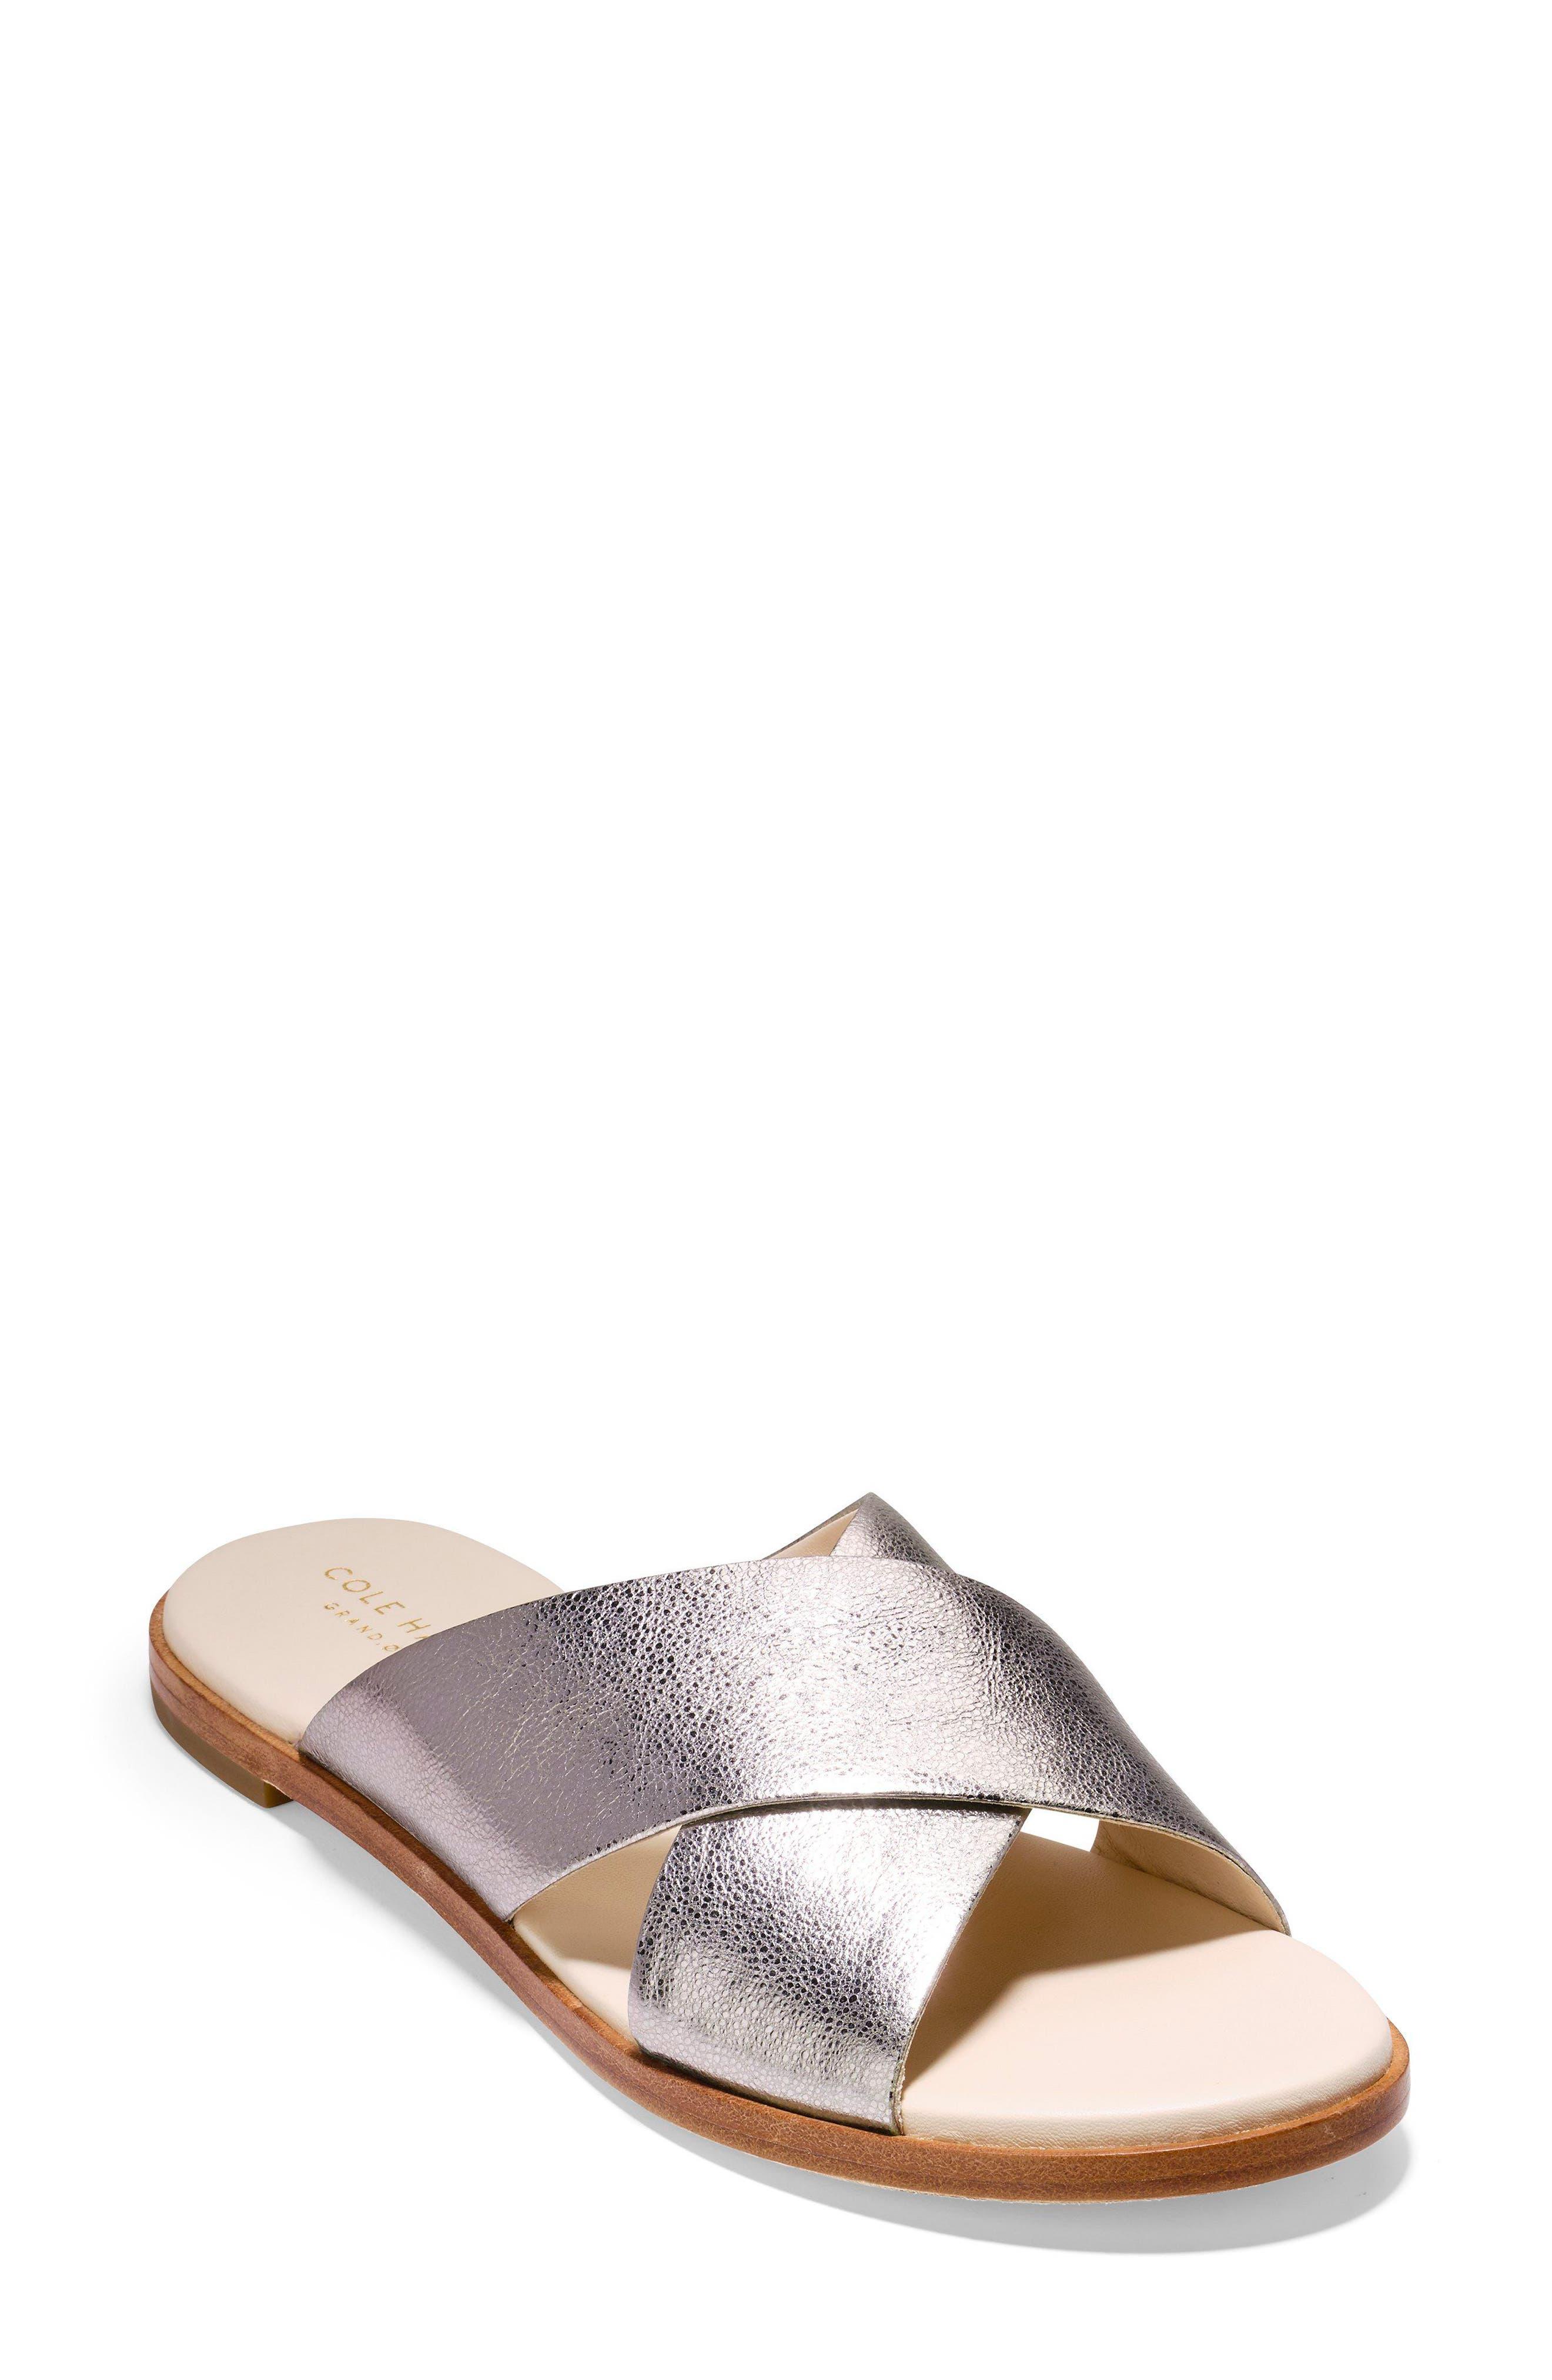 Main Image - Cole Haan Anica Slide Sandal (Women)